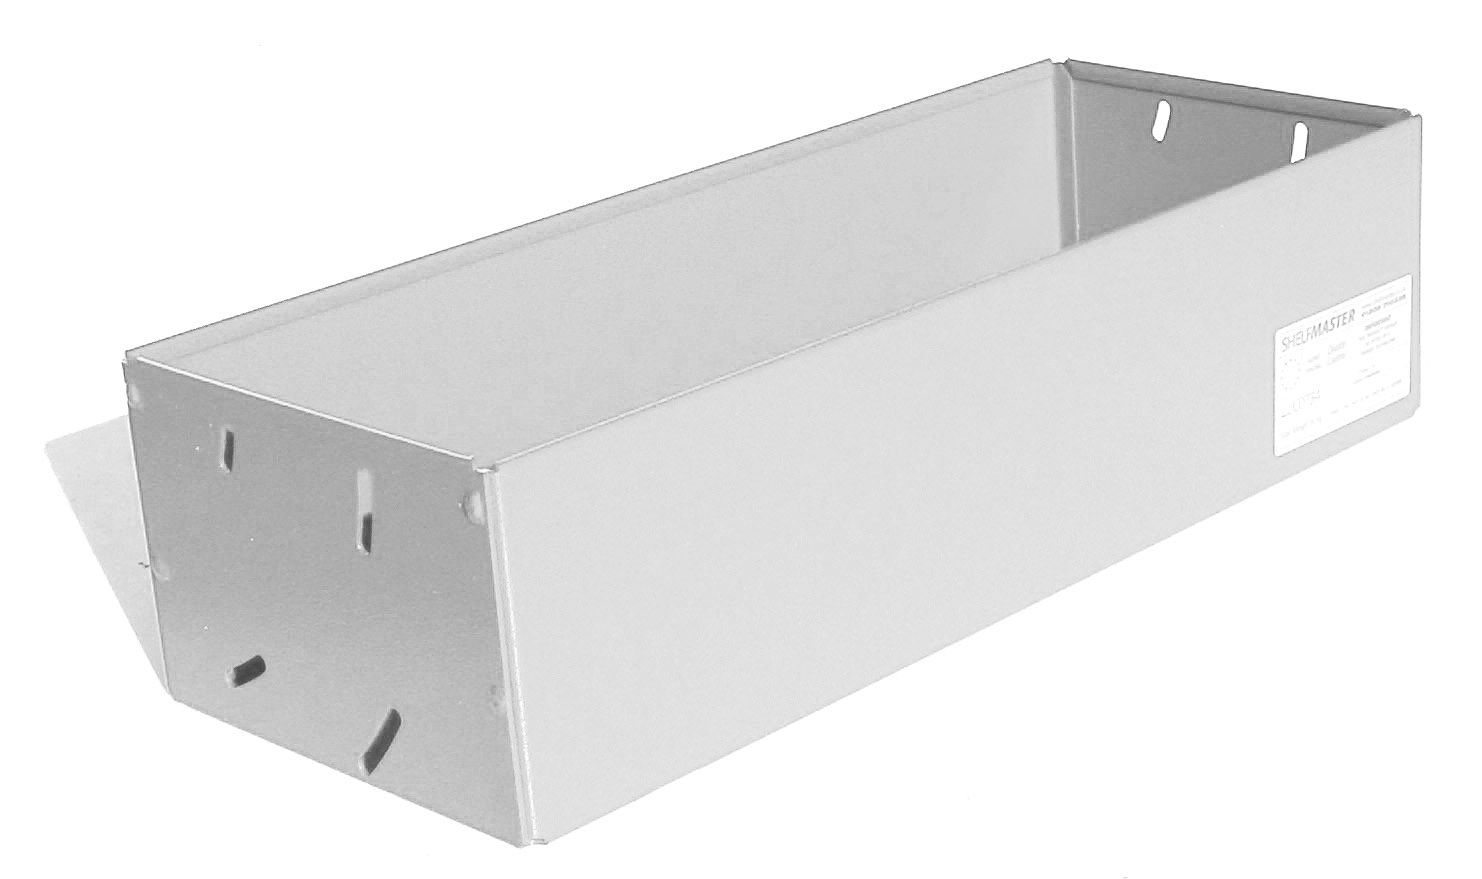 ShelfMaster Box Shelf 125mm x 190mm x 480mm   SMBS190/125